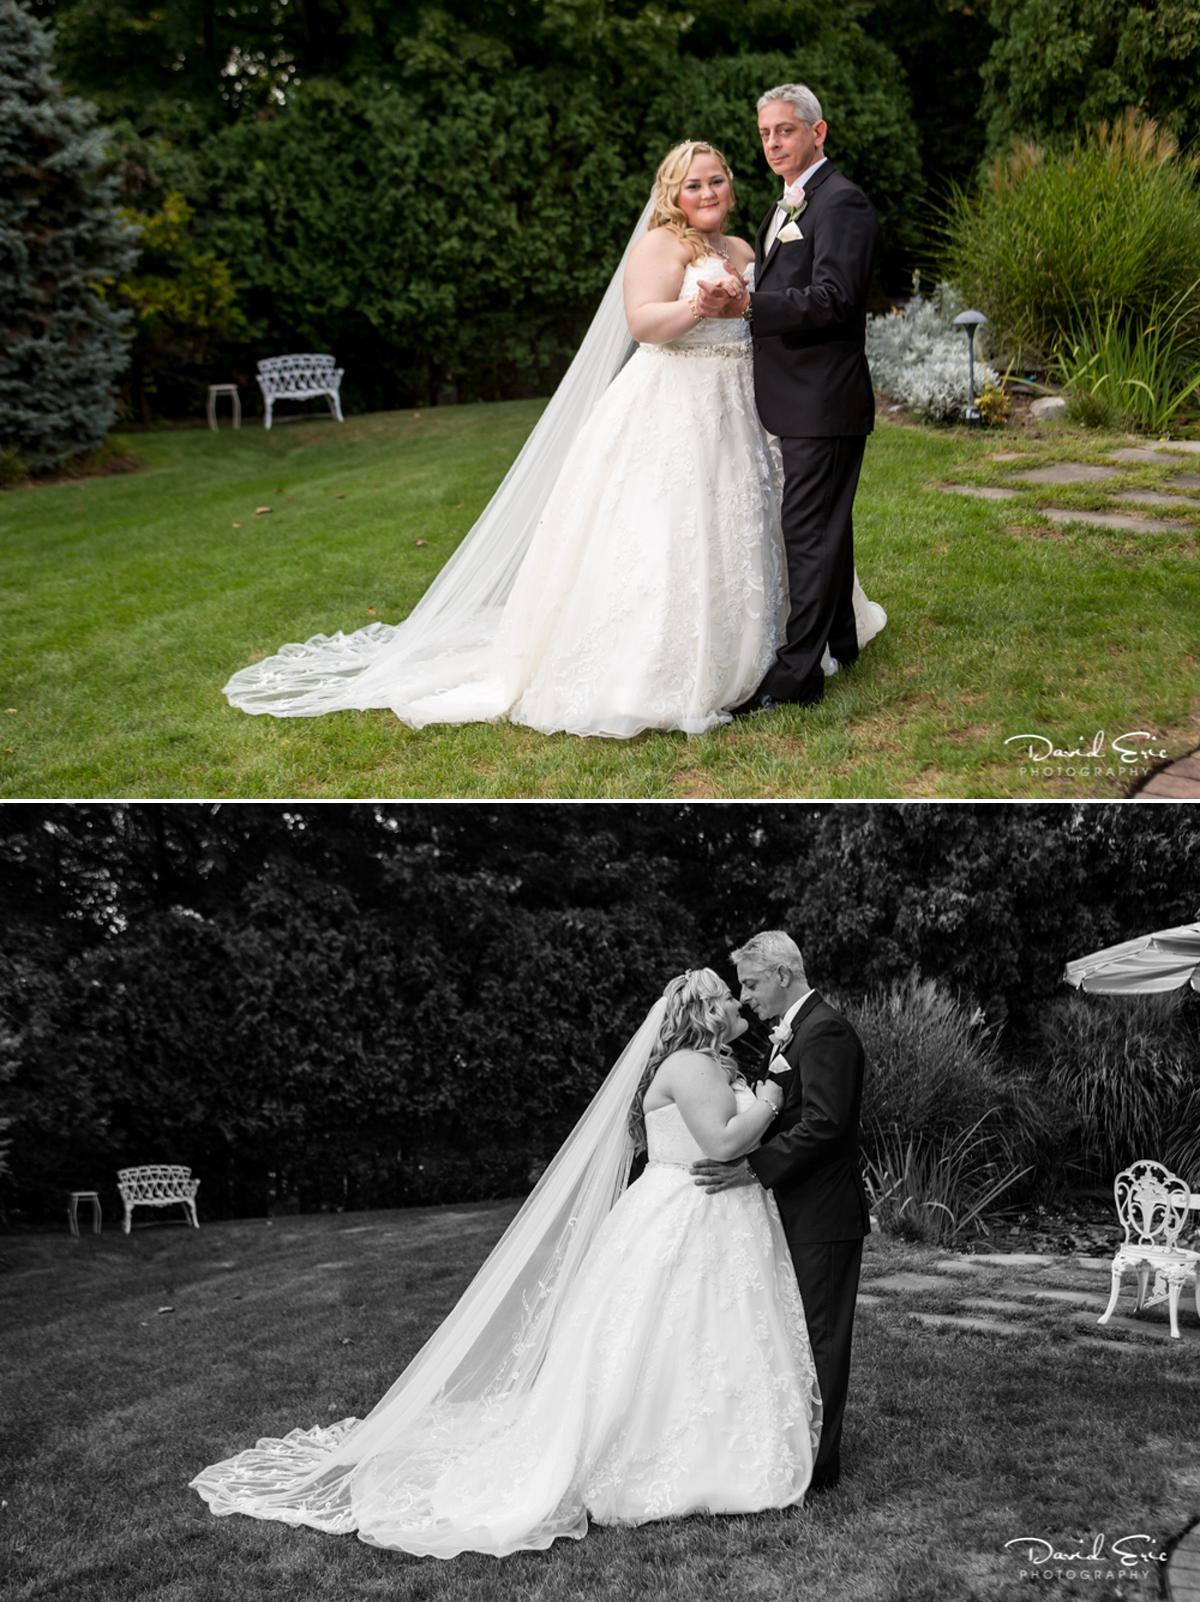 kronyak-wedding-david-eric-photography-woodcliff-lake-new-jersey-10